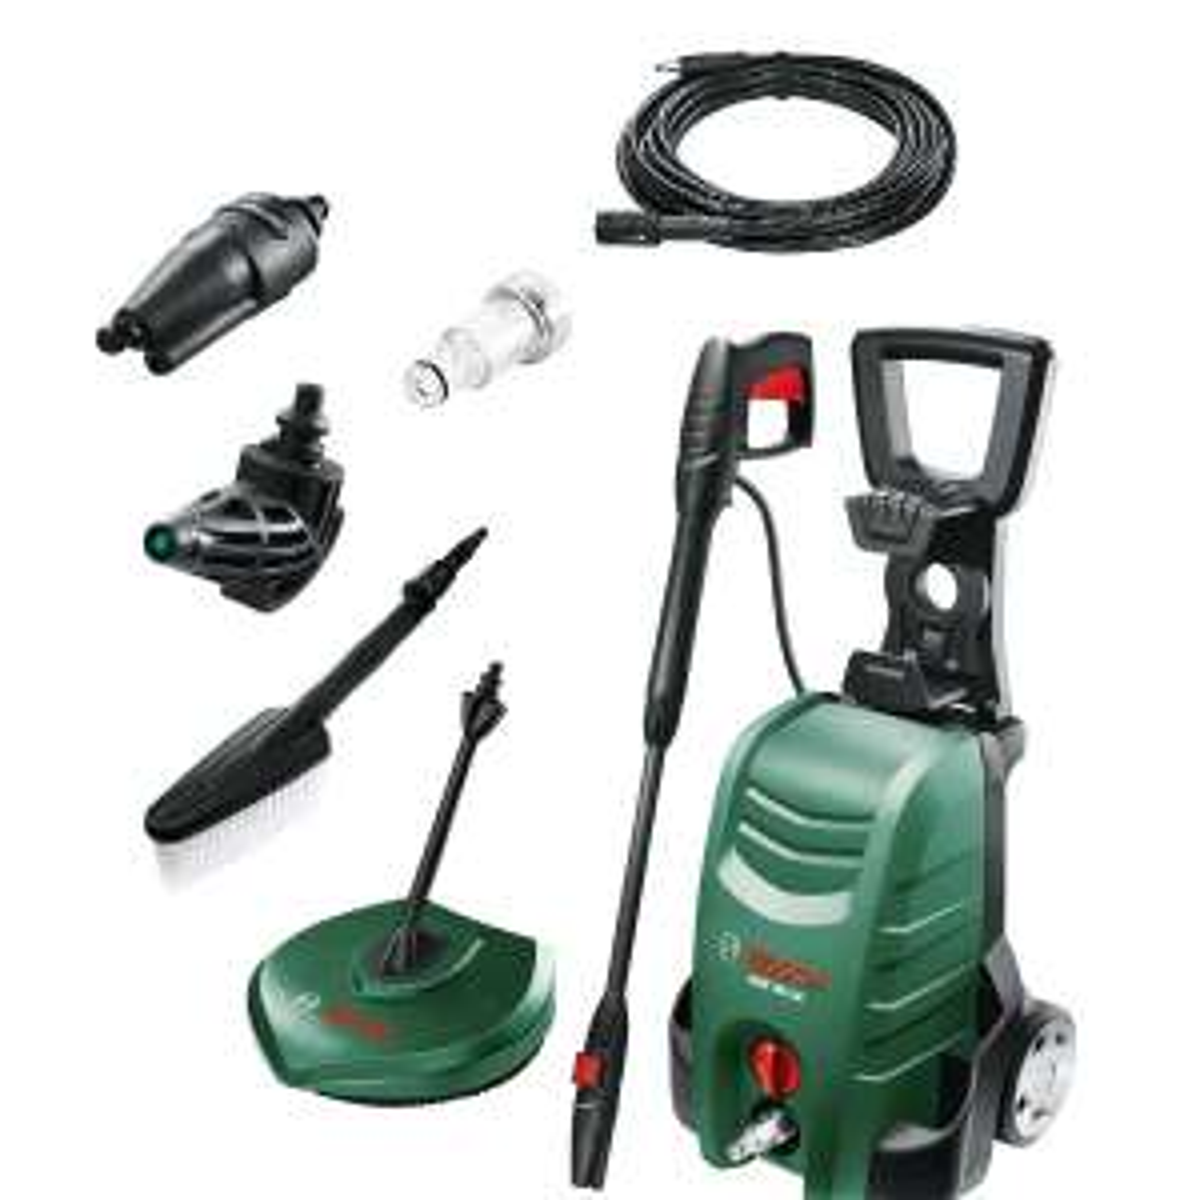 Bosch AQT 35-12 Combi High Pressure Washer Package £79.99 - COSTCO online